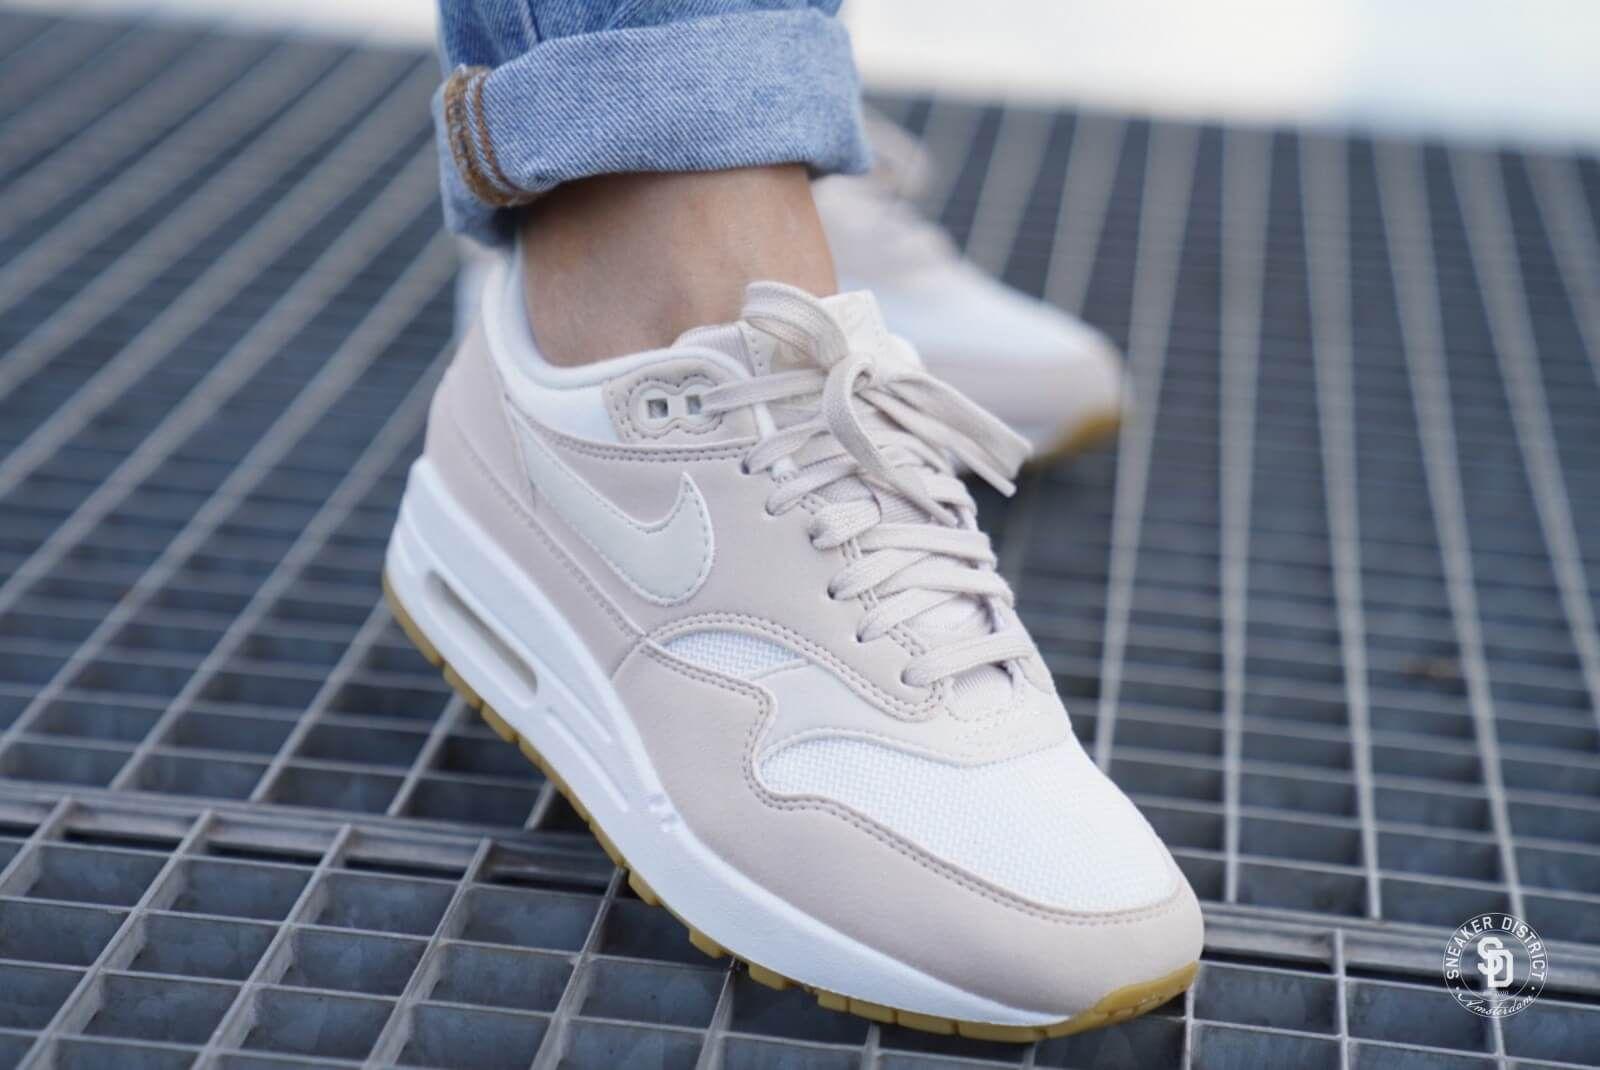 maat 38,5 ;) Nike Women's Air Max 1 Desert SandPhantom